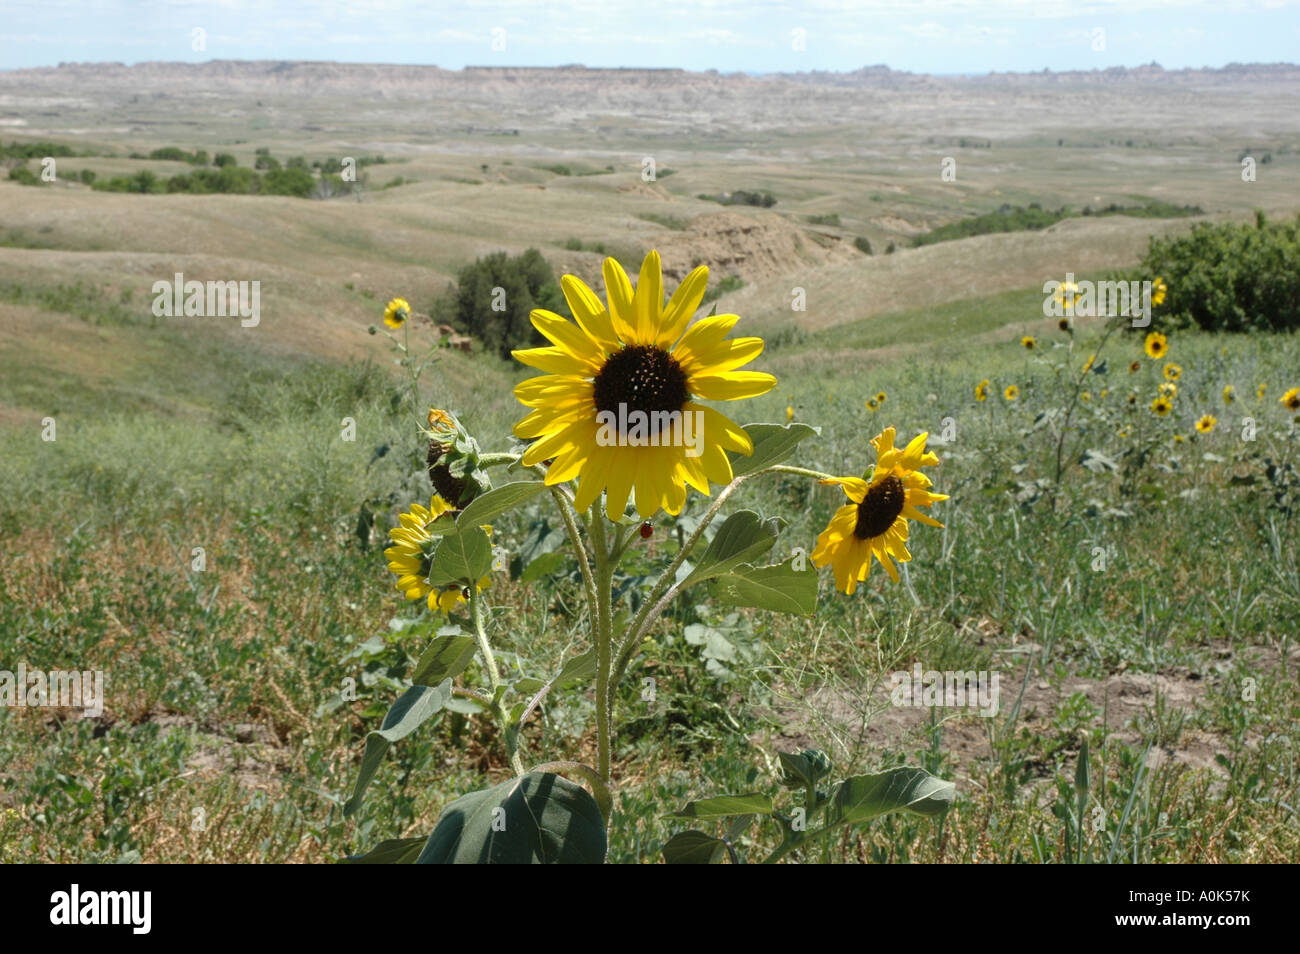 P31 092 Badlands National Park Near Roberts Prairie Dog Town Stock